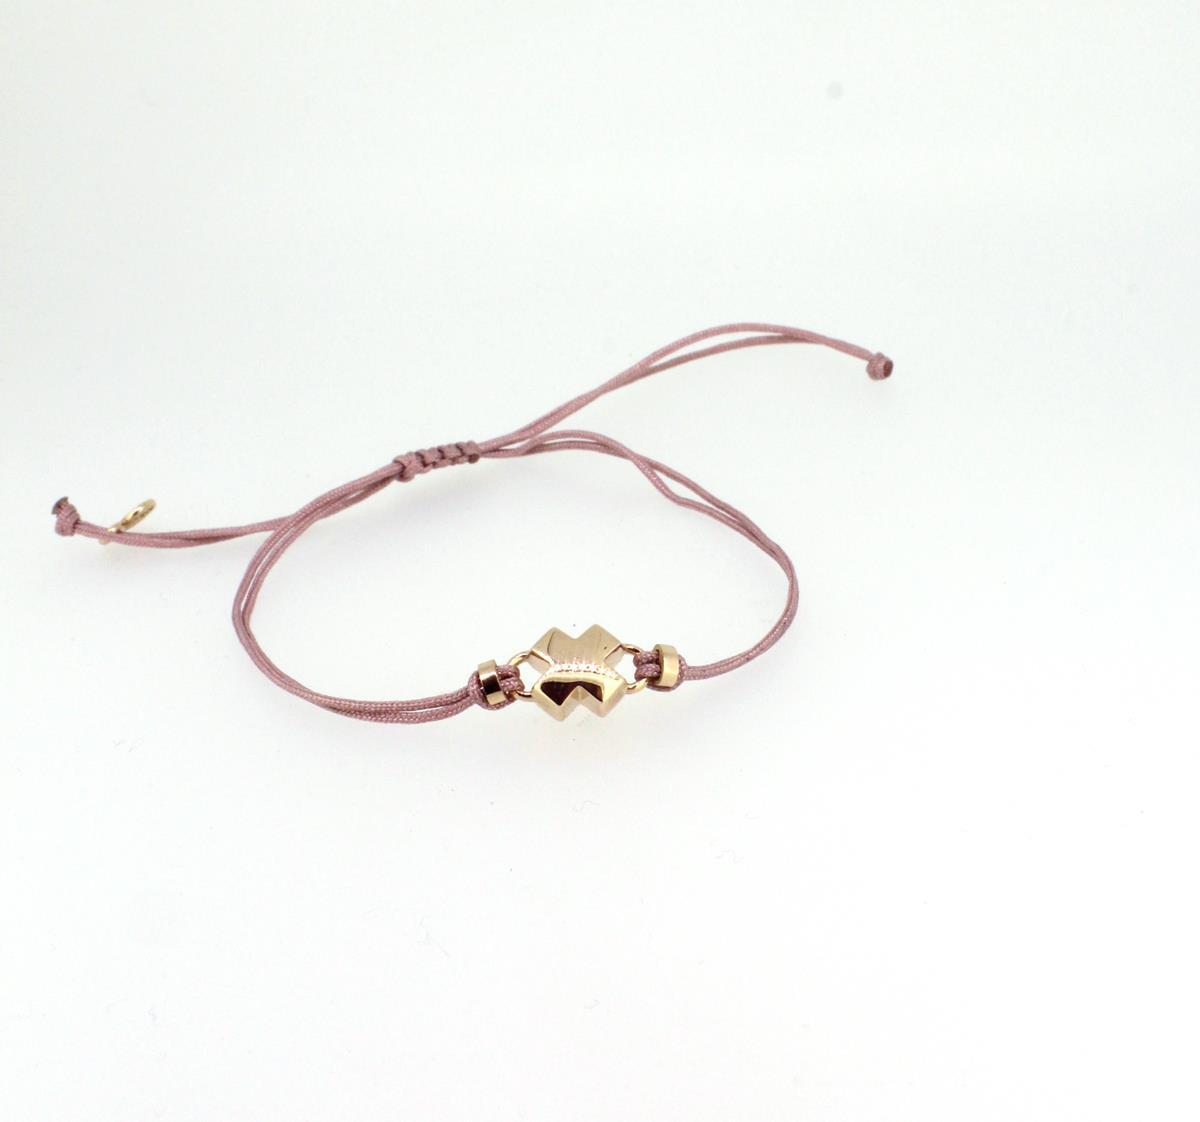 Armband Küsschen18ct Roségold - Bron - 8AR3981